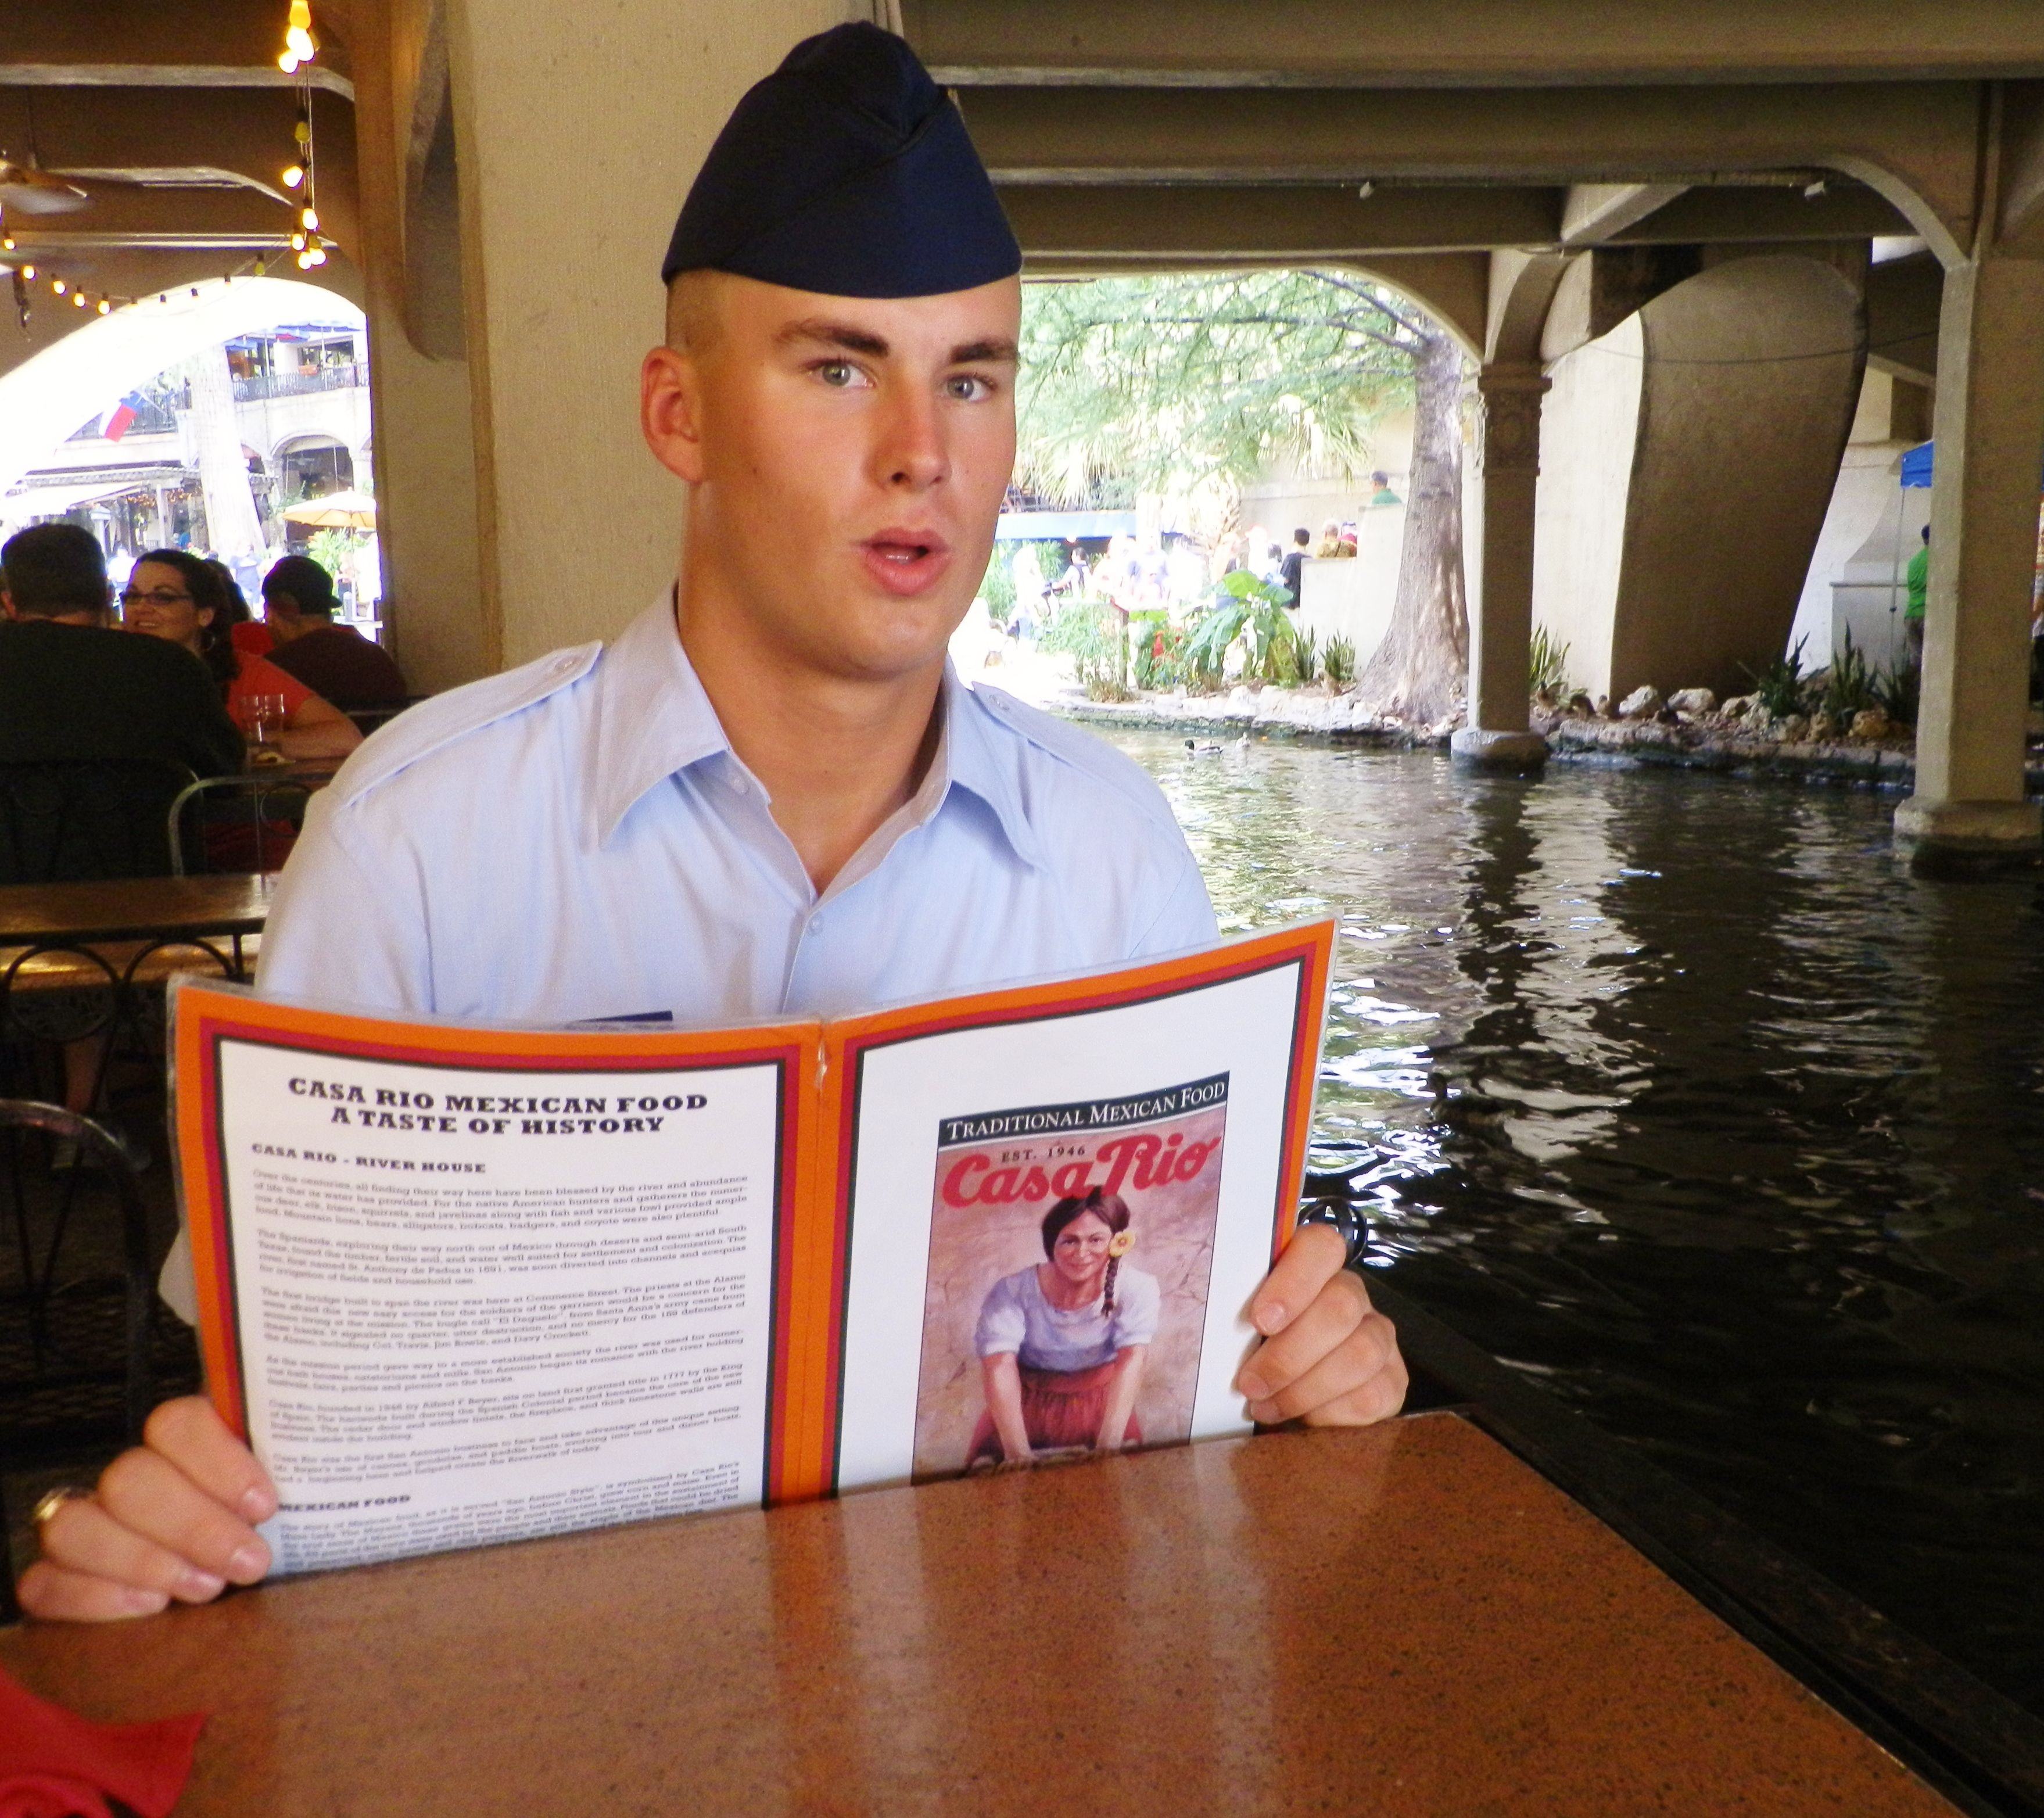 After Air Force graduation at Lackland Air Force Base, we